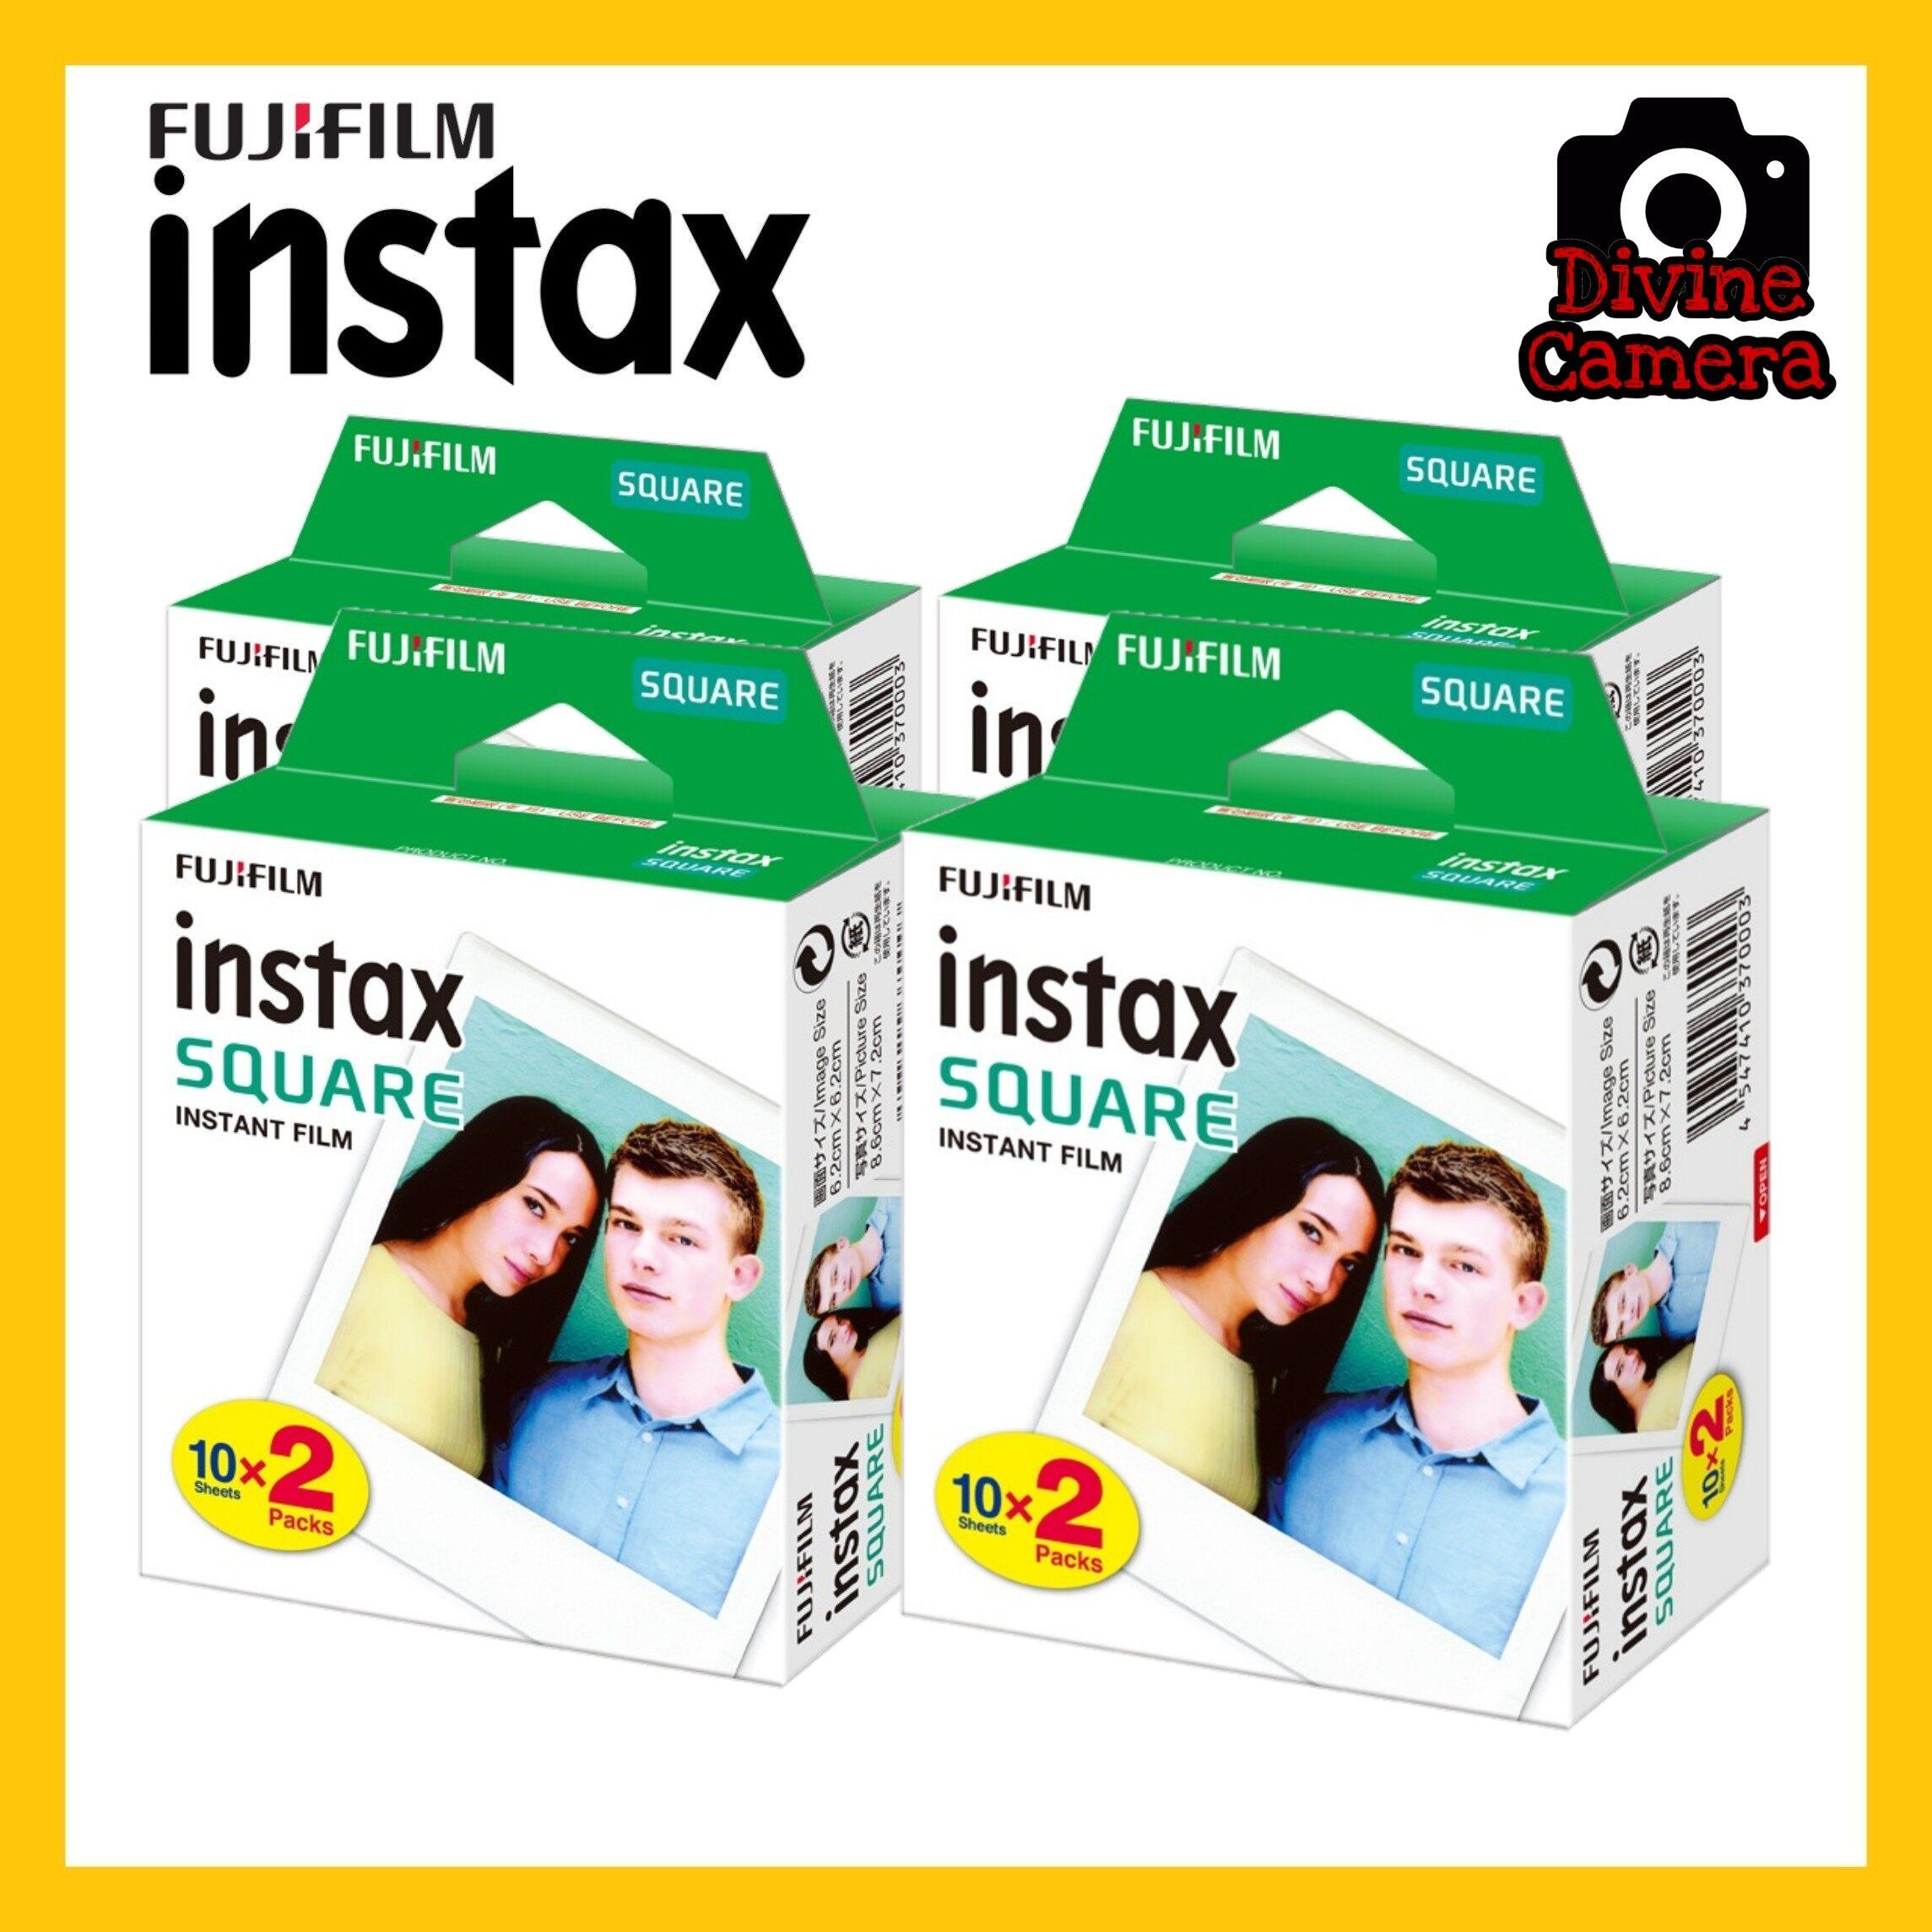 FUJIFILM INSTAX SQUARE Instant Film (20 Sheets)